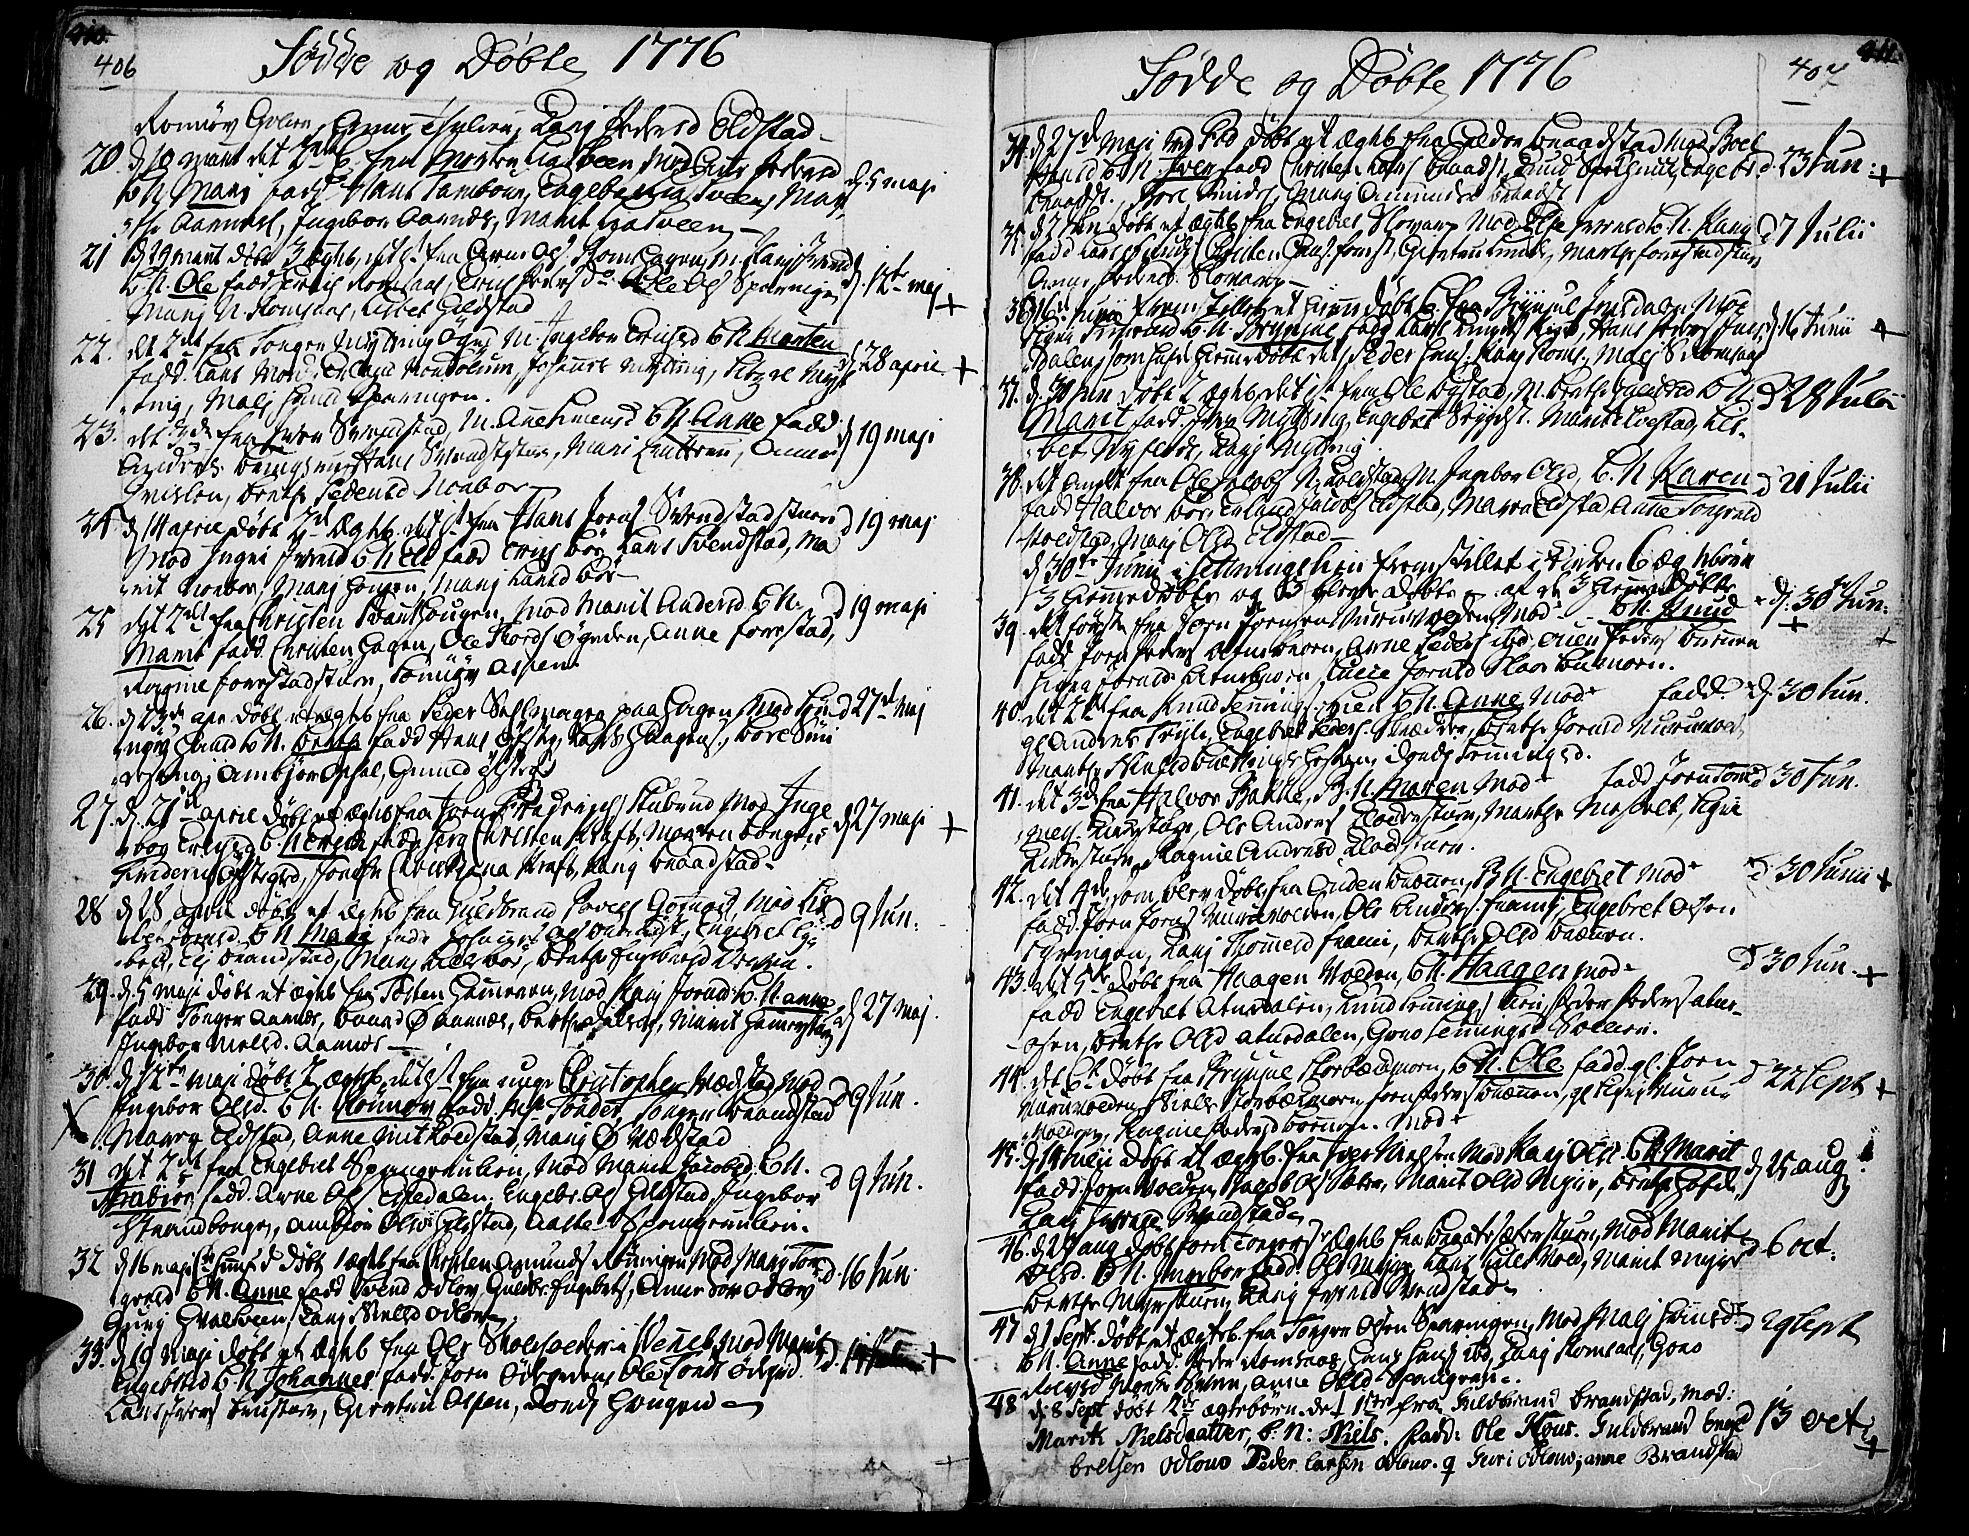 SAH, Ringebu prestekontor, Ministerialbok nr. 2, 1734-1780, s. 406-407